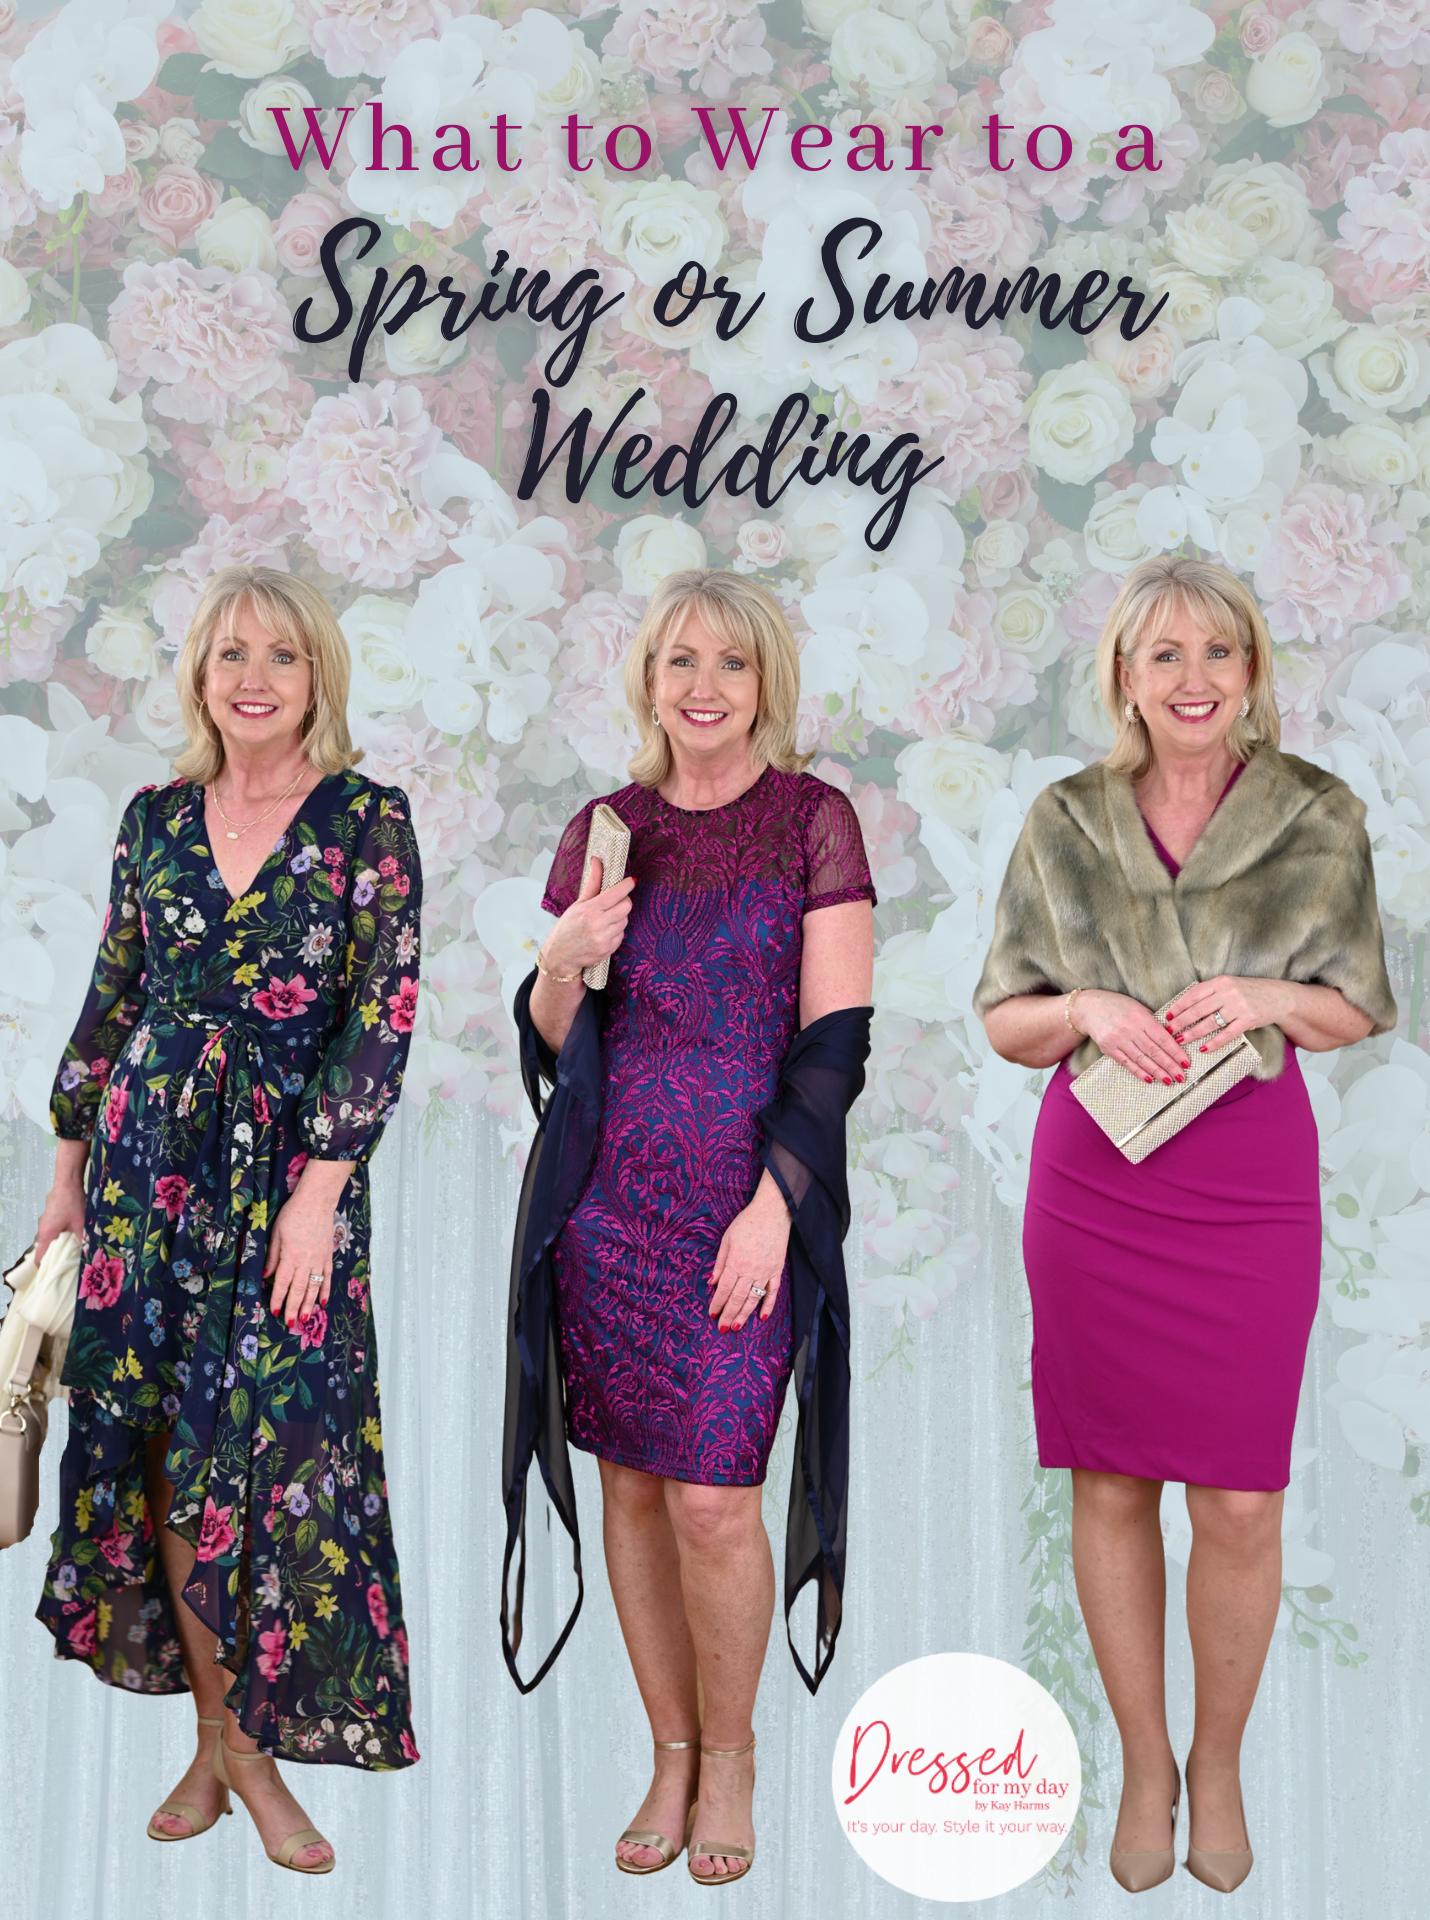 Spring or Summer Wedding Guest